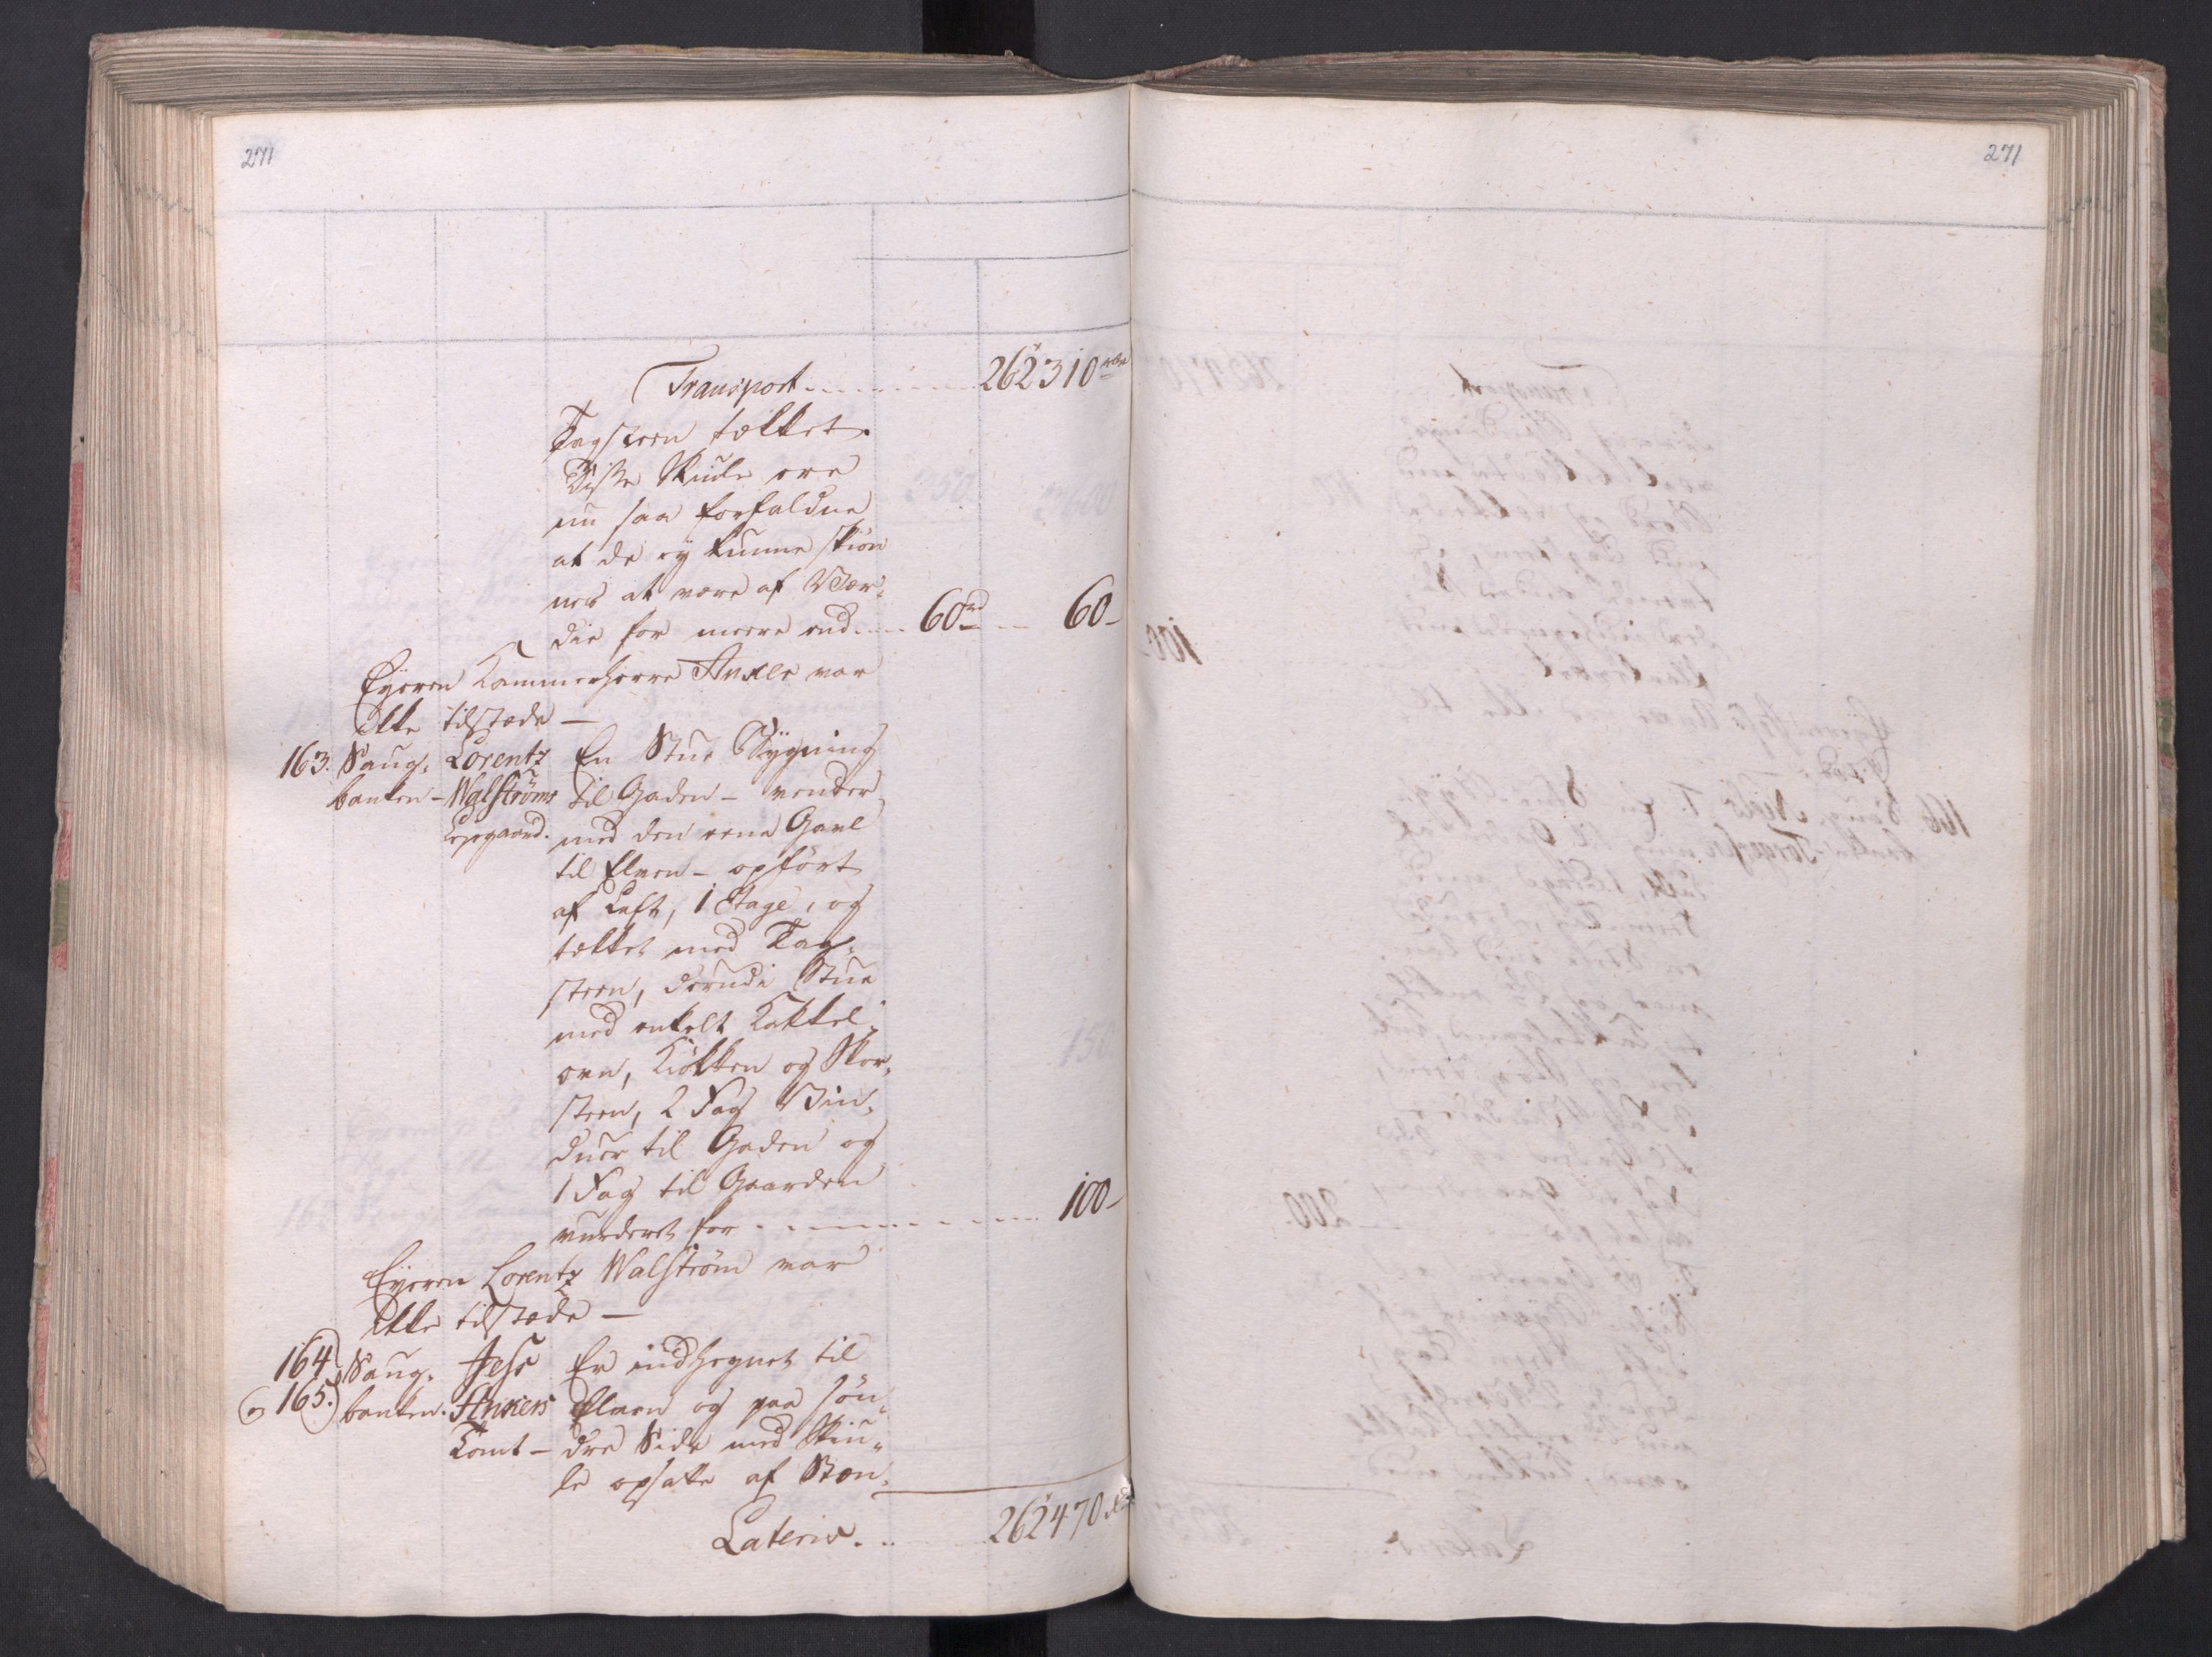 SAO, Kristiania stiftamt, I/Ia/L0015: Branntakster, 1797, s. 271